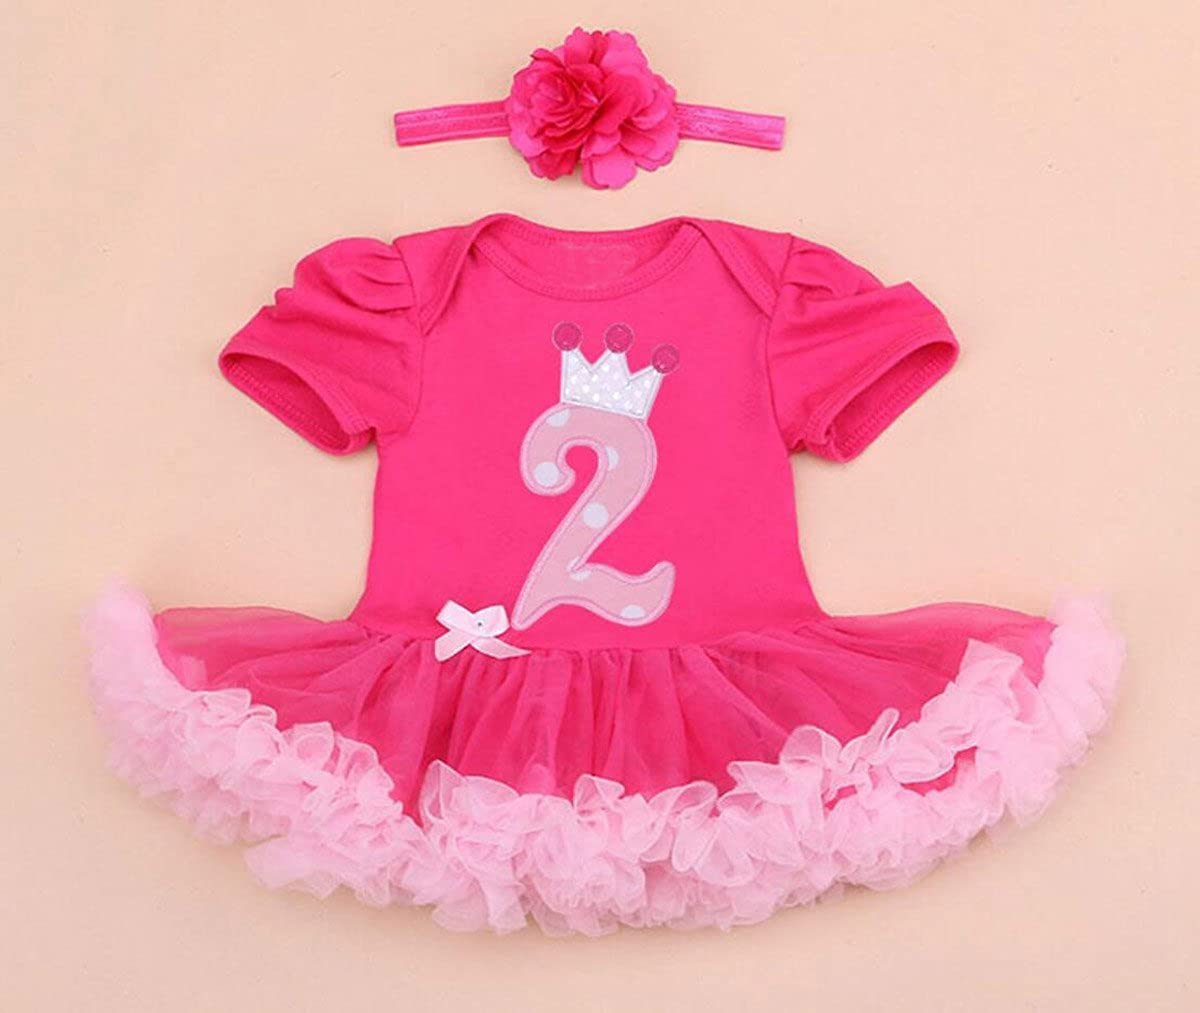 Rock Rosa rosa Marlegard Baby M/ädchen 0-24 Monate